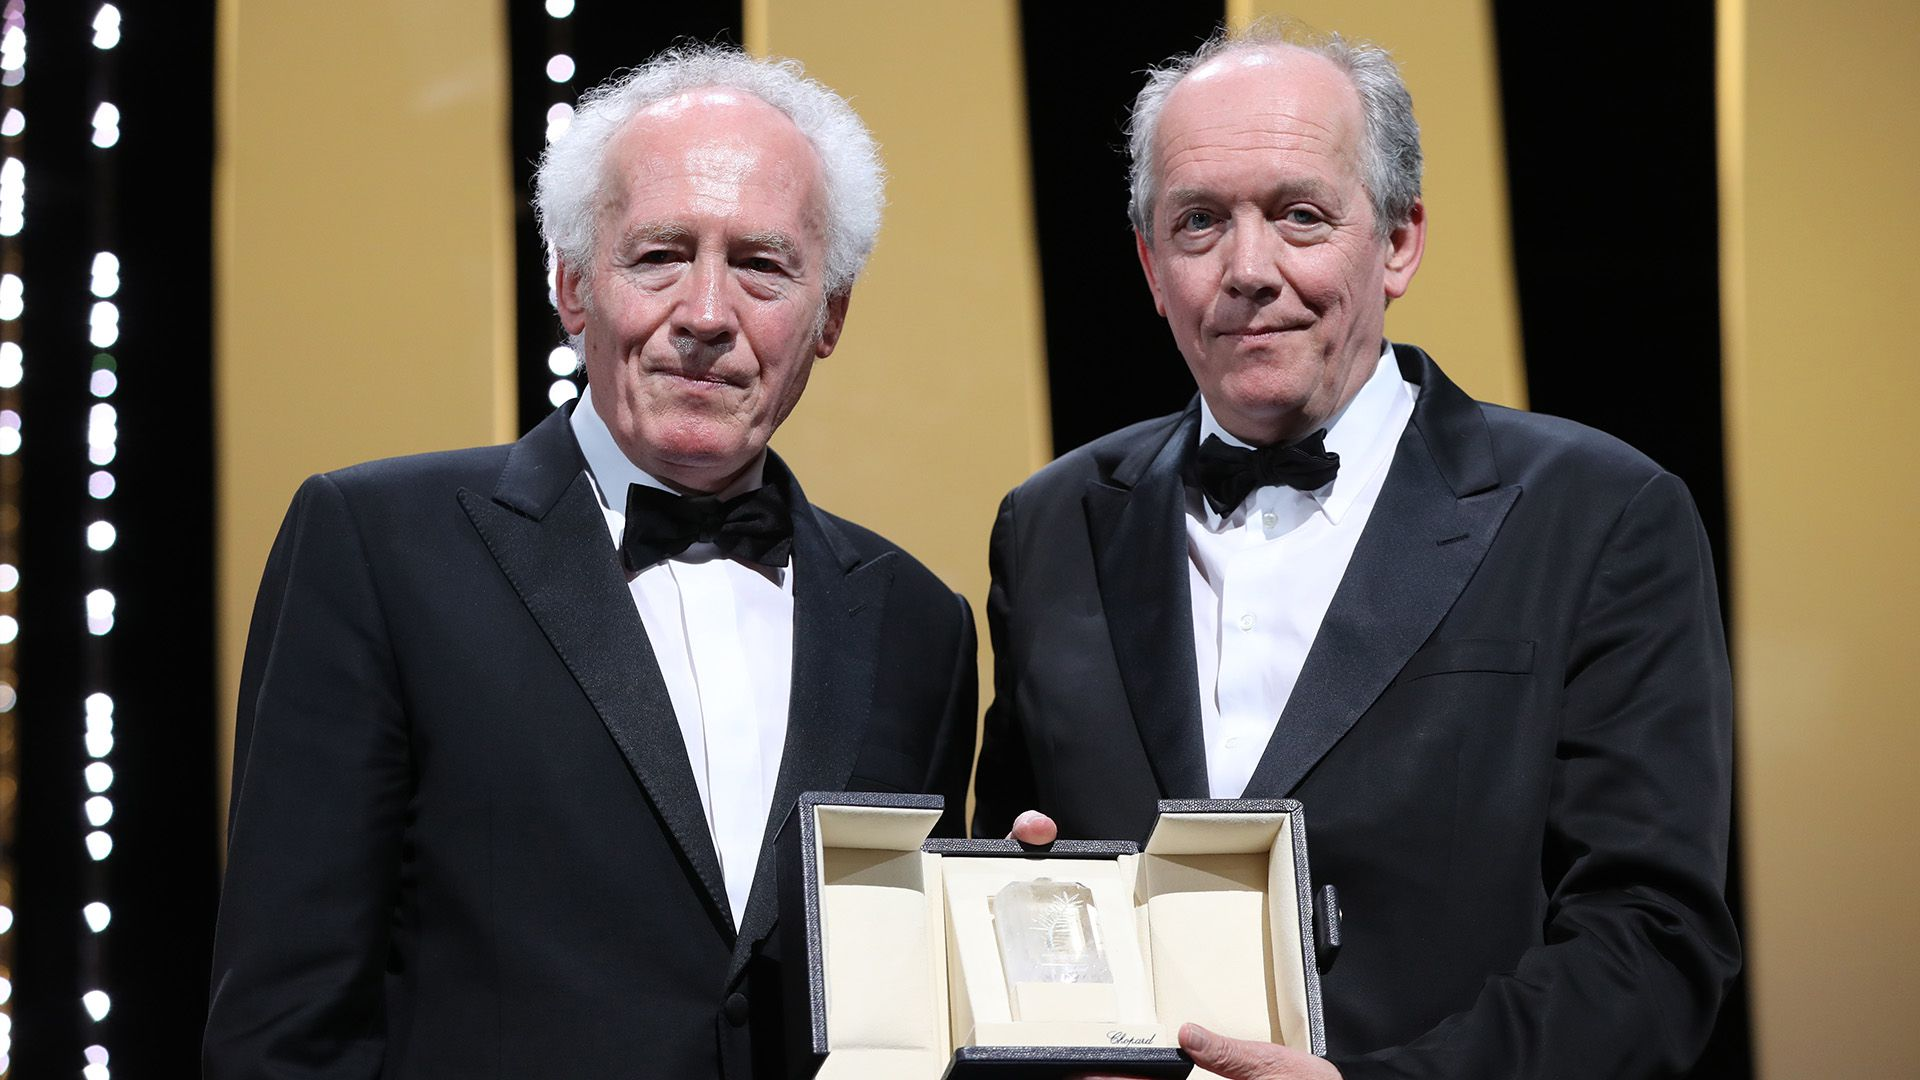 Luc y Jean-Pierre Dardenne (Photo by Valery HACHE / AFP)